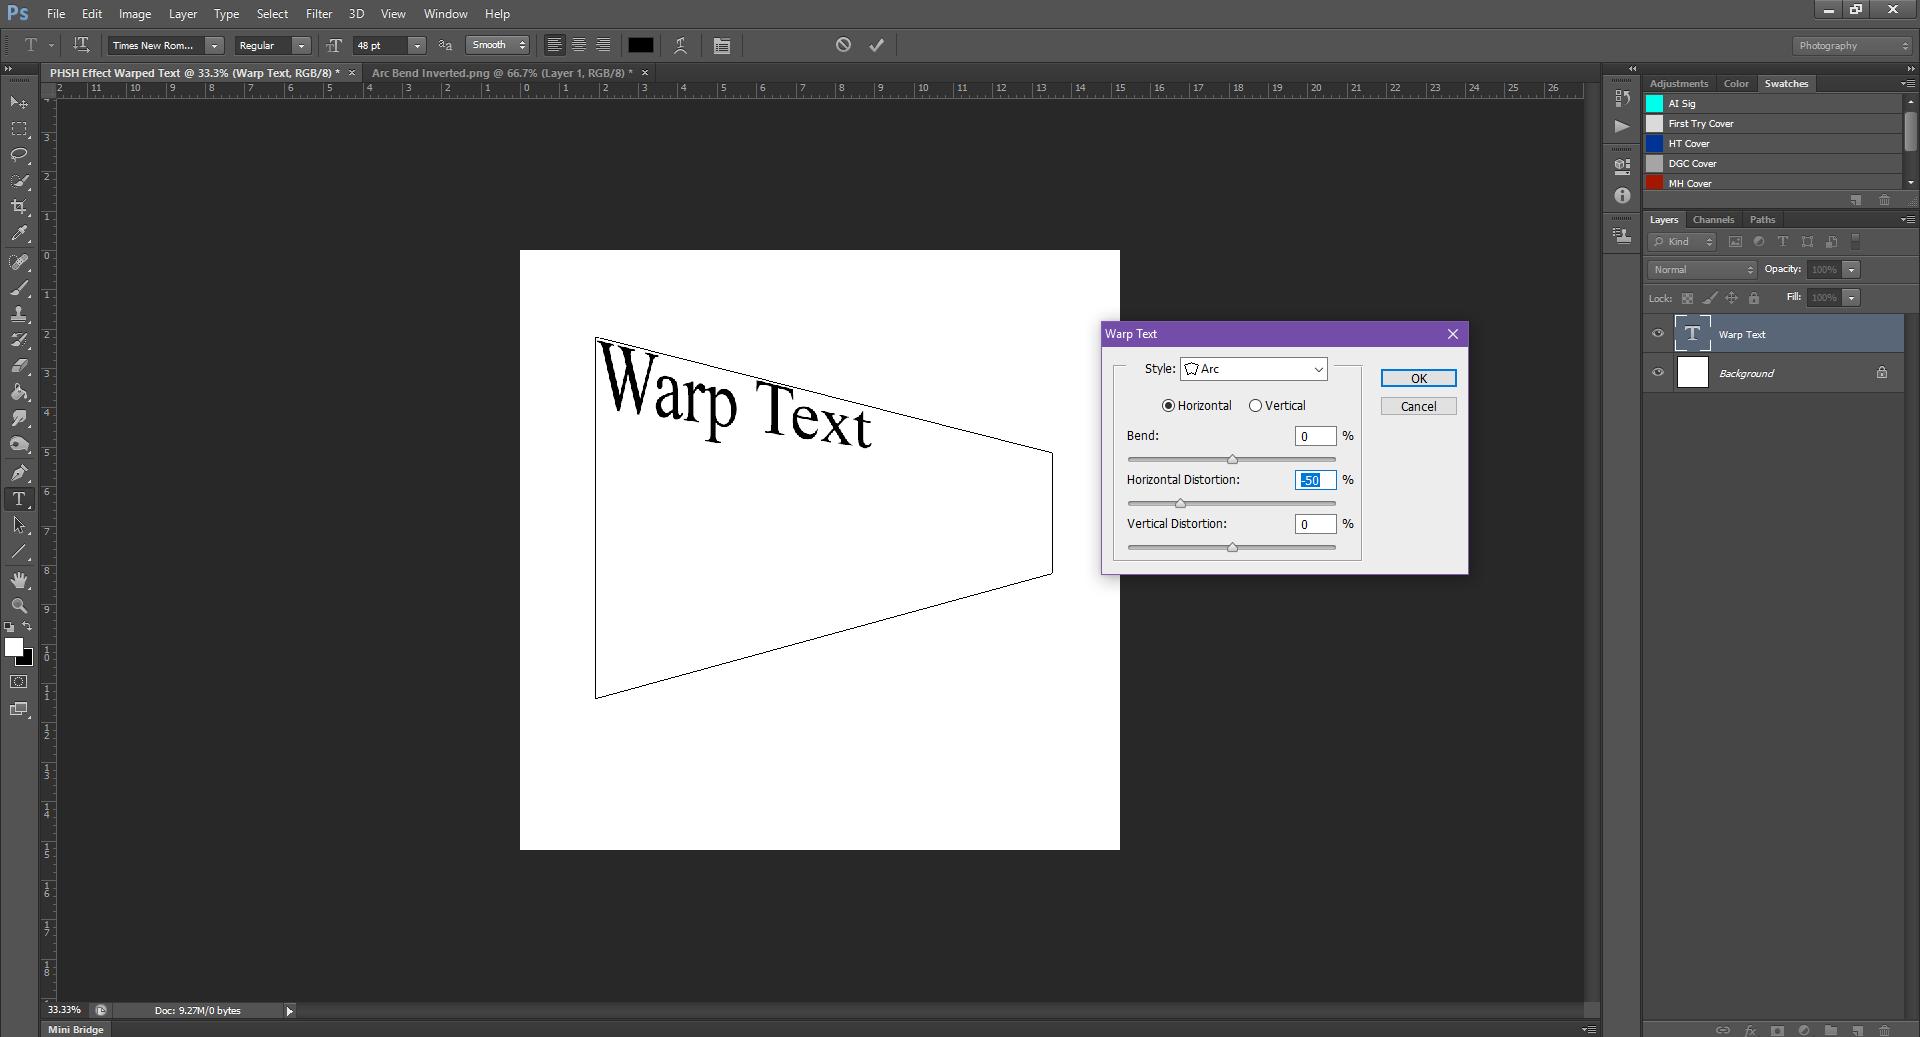 AterImber.com - Writing - Writing Tips - PHSH Tutorial - Warped Text - Horizontal Distortion Inverted